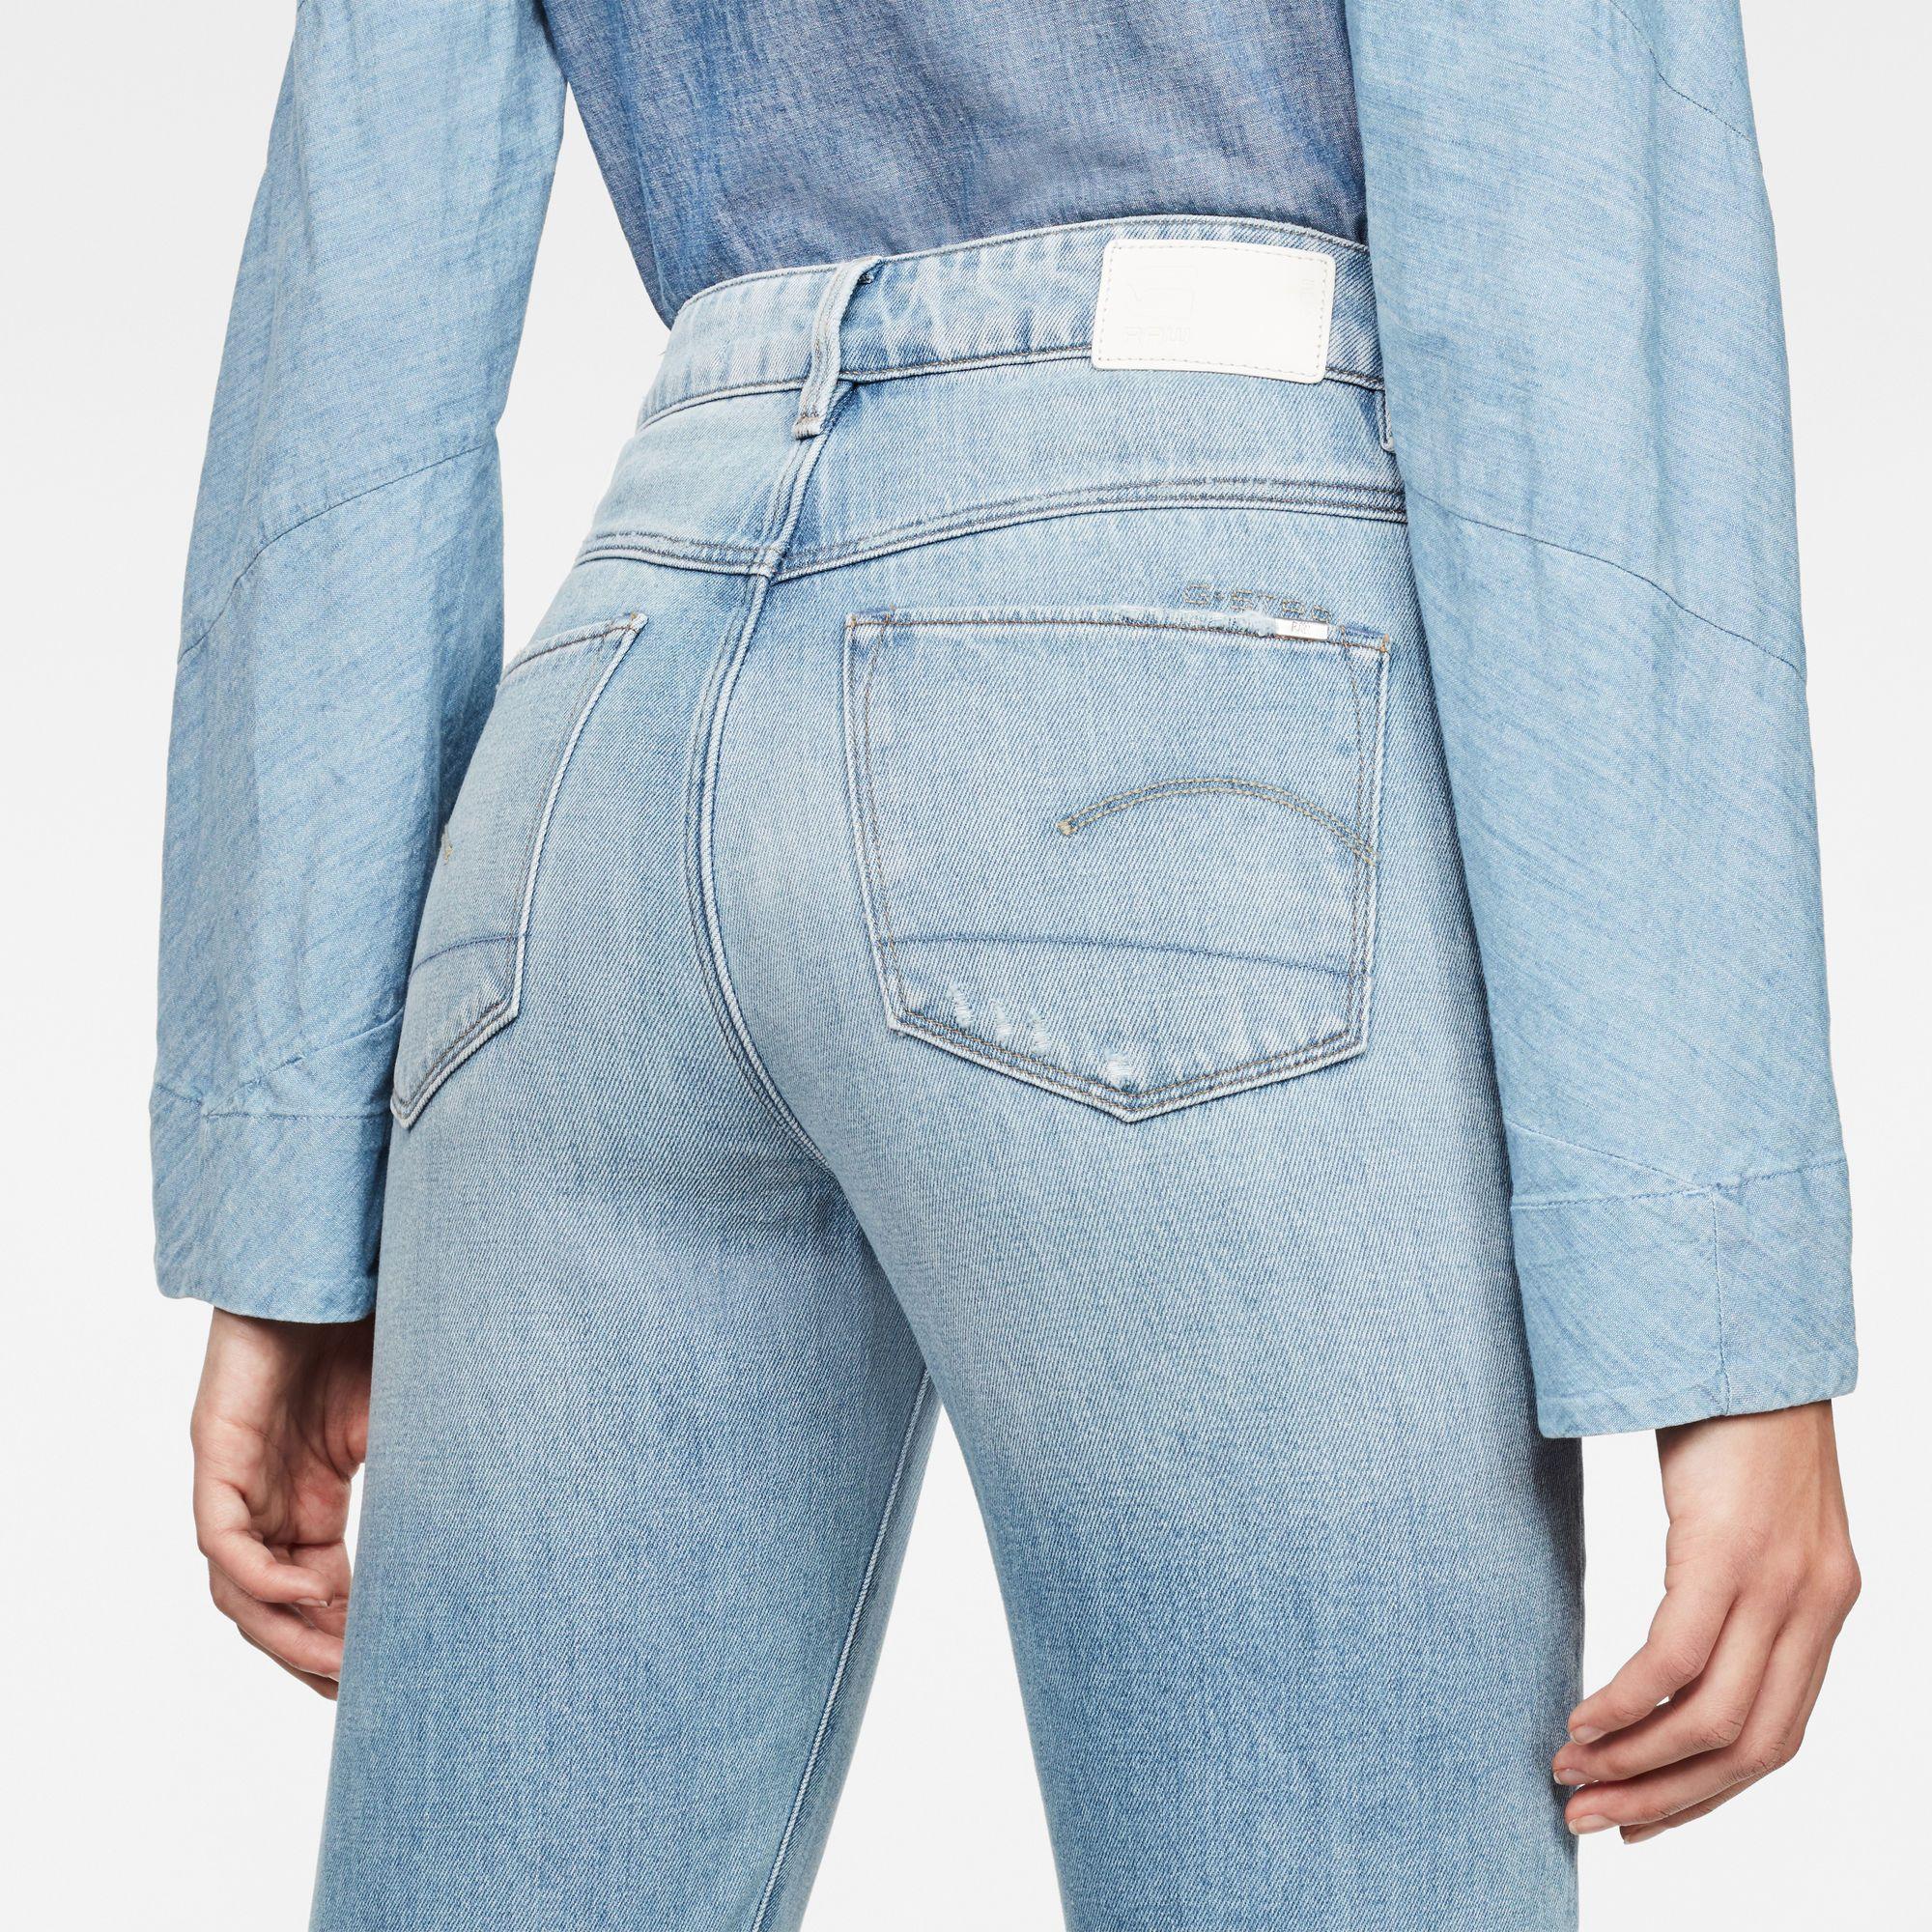 G-Star RAW 3301 Ultra-High Waist Skinny 7/8 3D-Restored Jeans